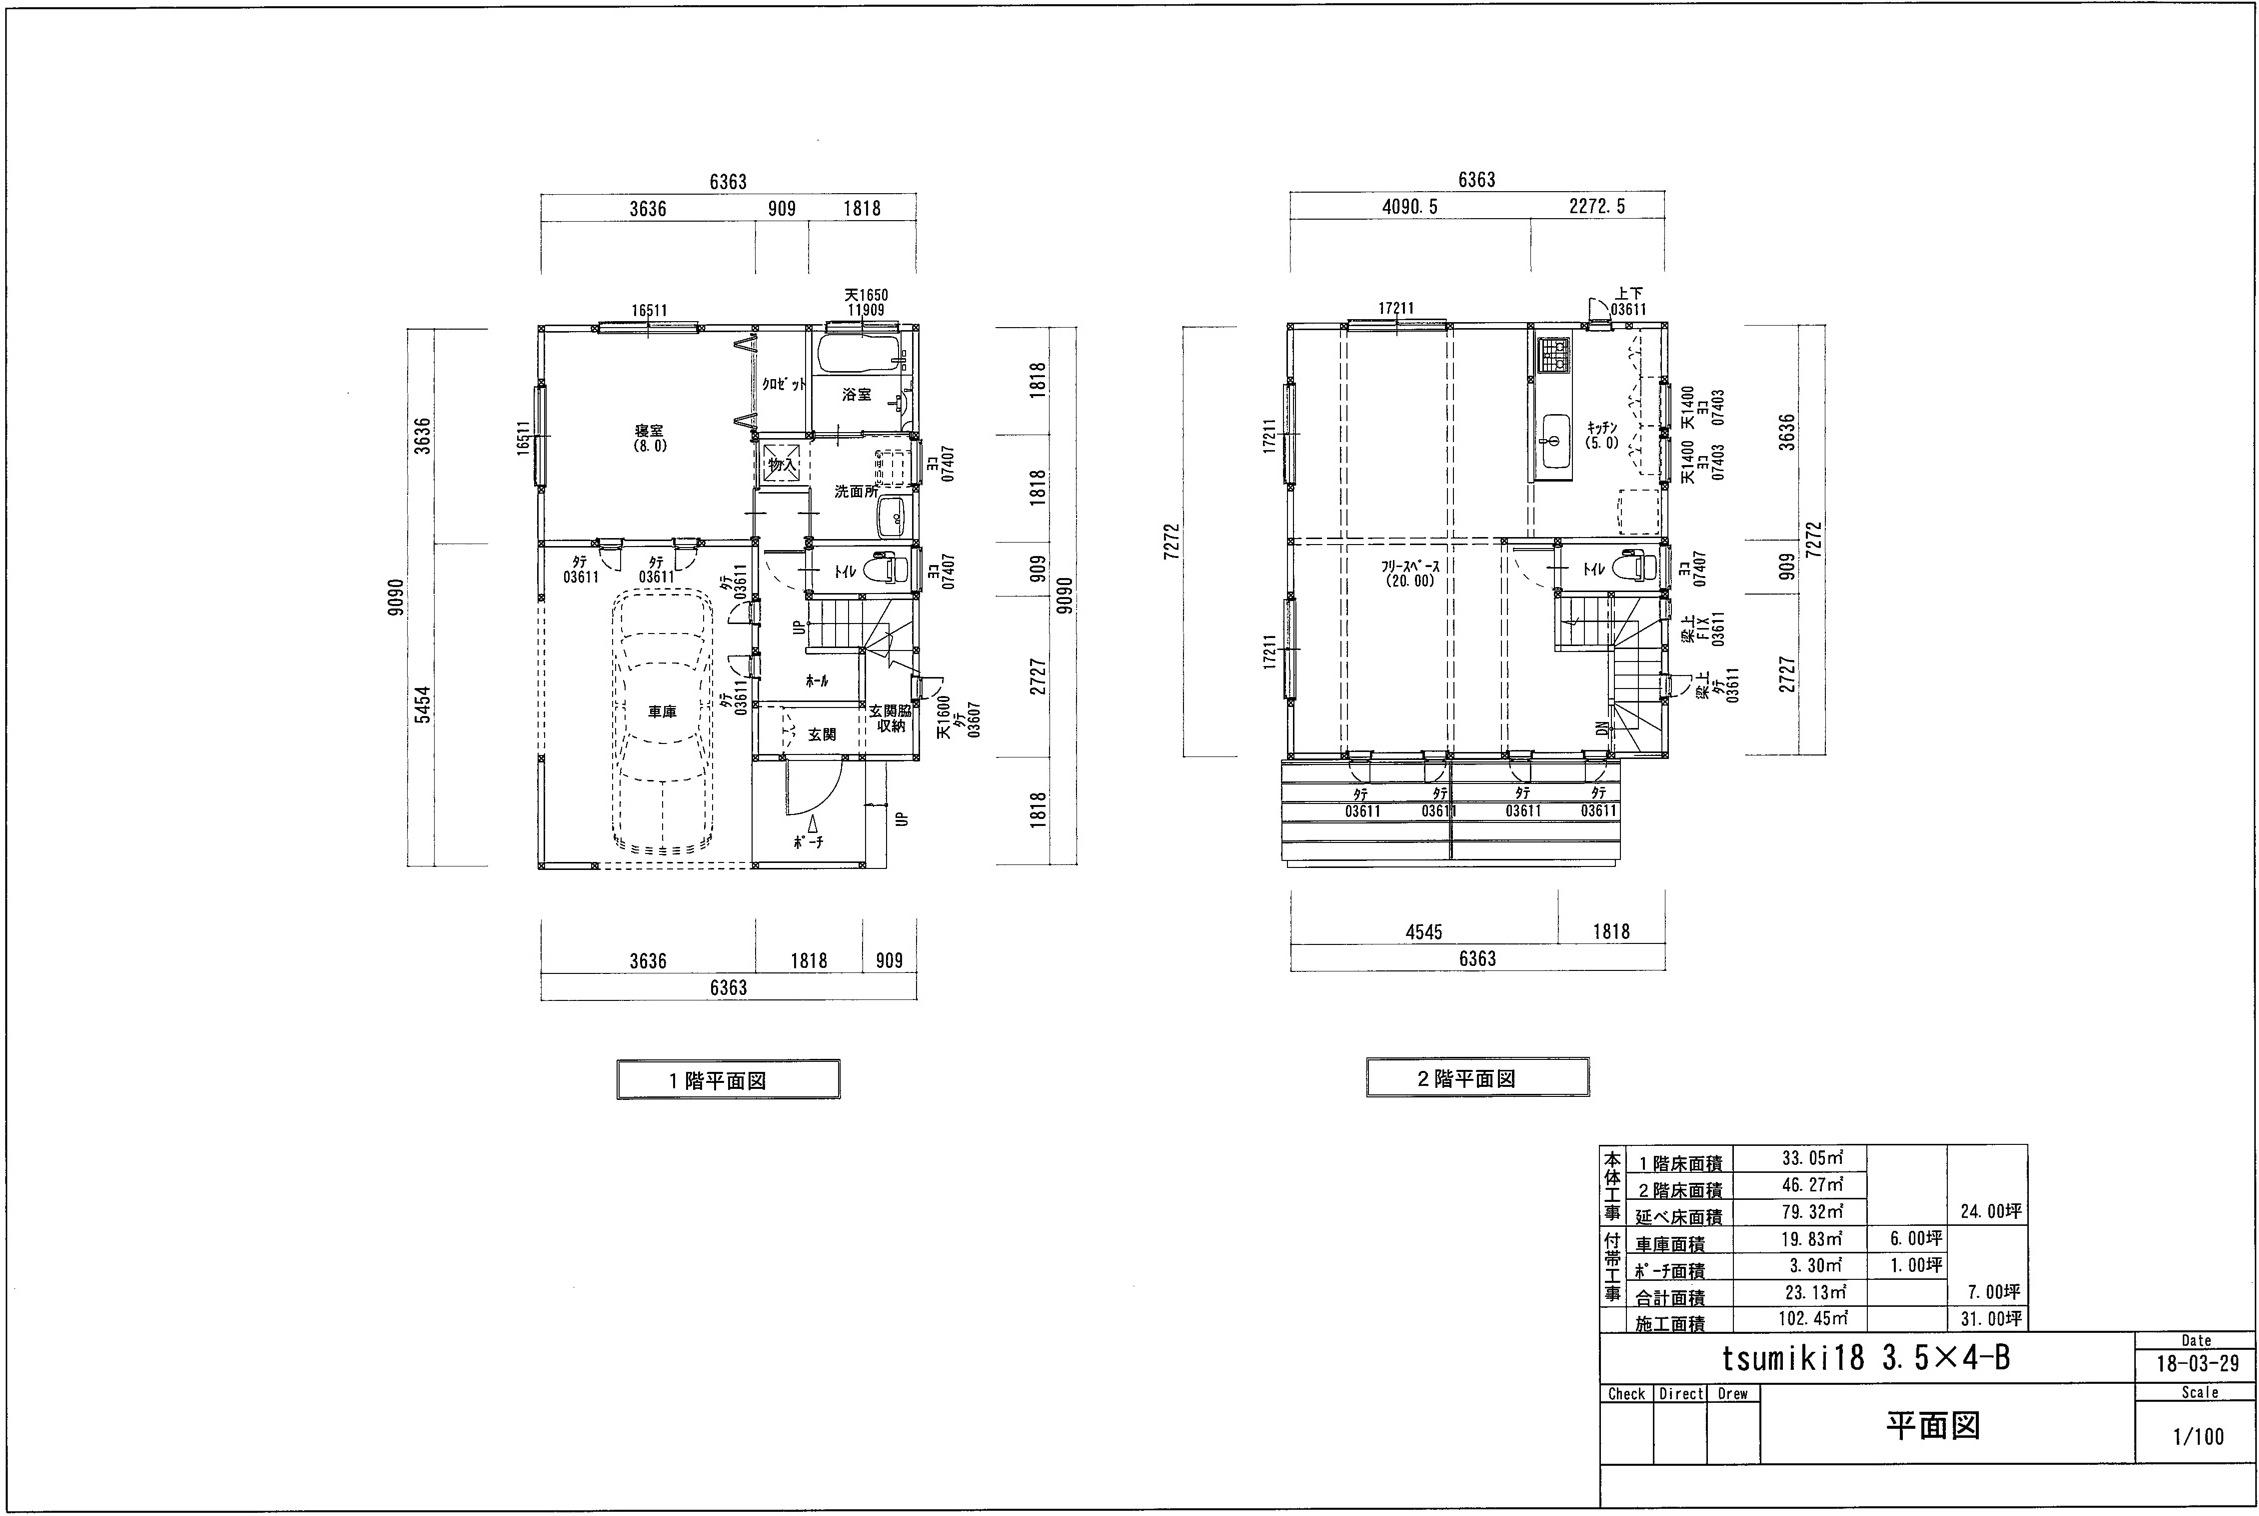 tsumiki 31坪 (3.5×4-B):画像